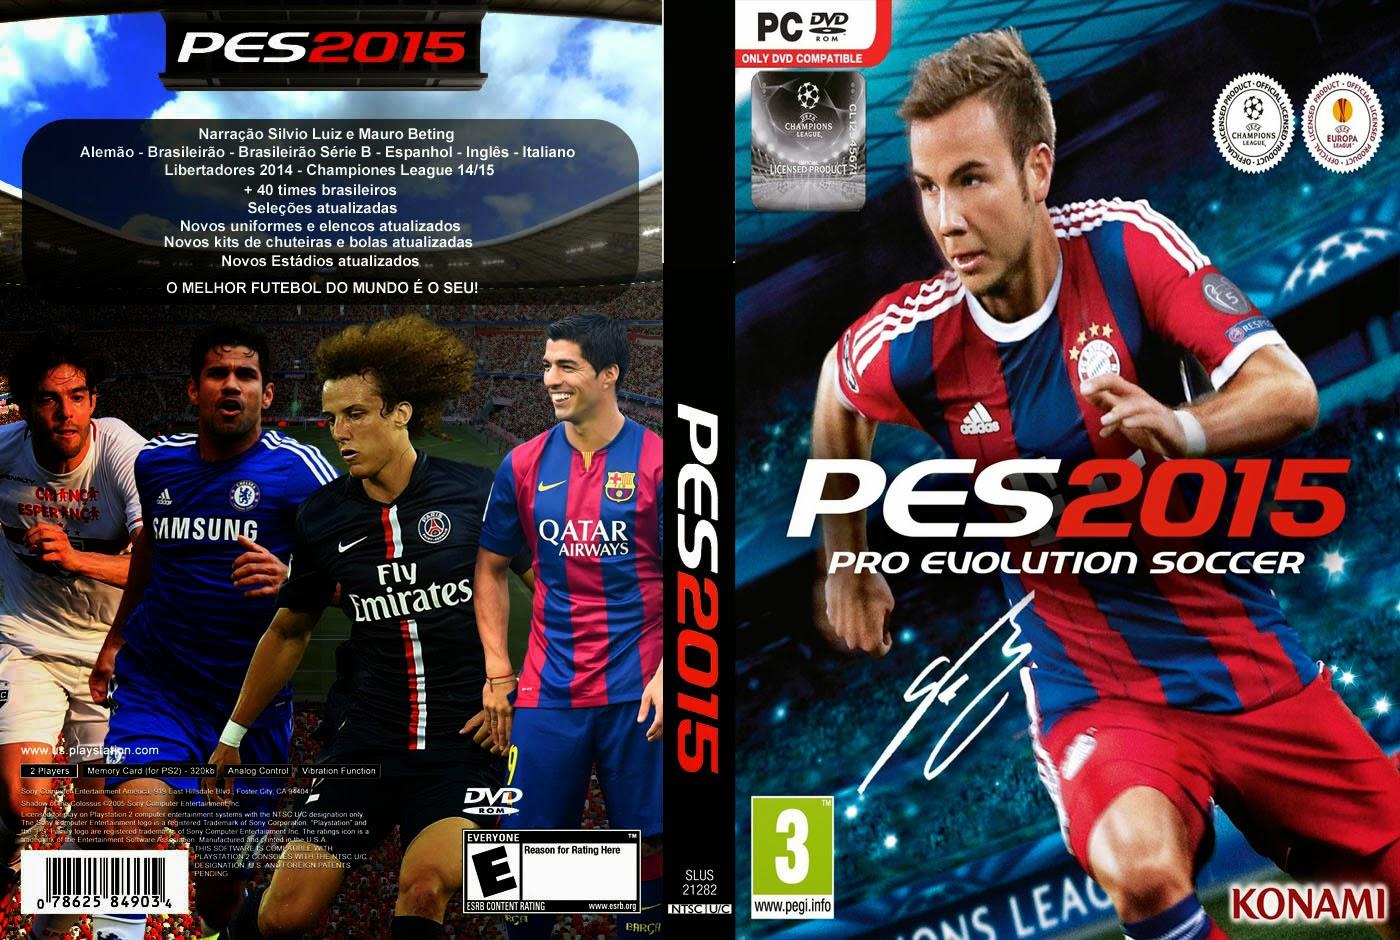 Baixar Pro Evolution Soccer 2015 PC XANDAODOWNLOAD 2B  2BPES 2B2015